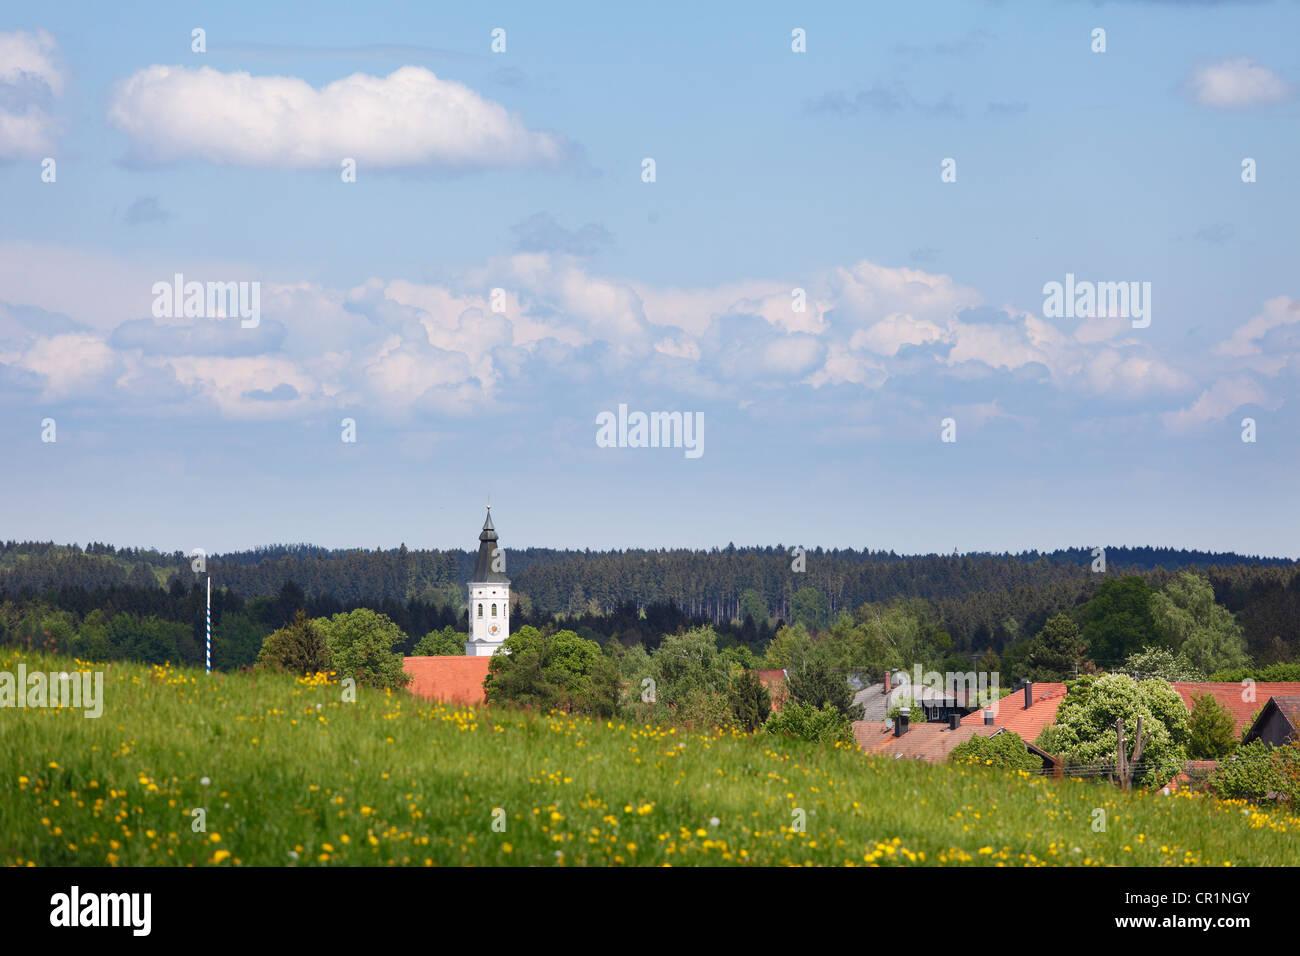 Degerndorf, Muensing community, Upper Bavaria, Bavaria, Germany, Europe - Stock Image